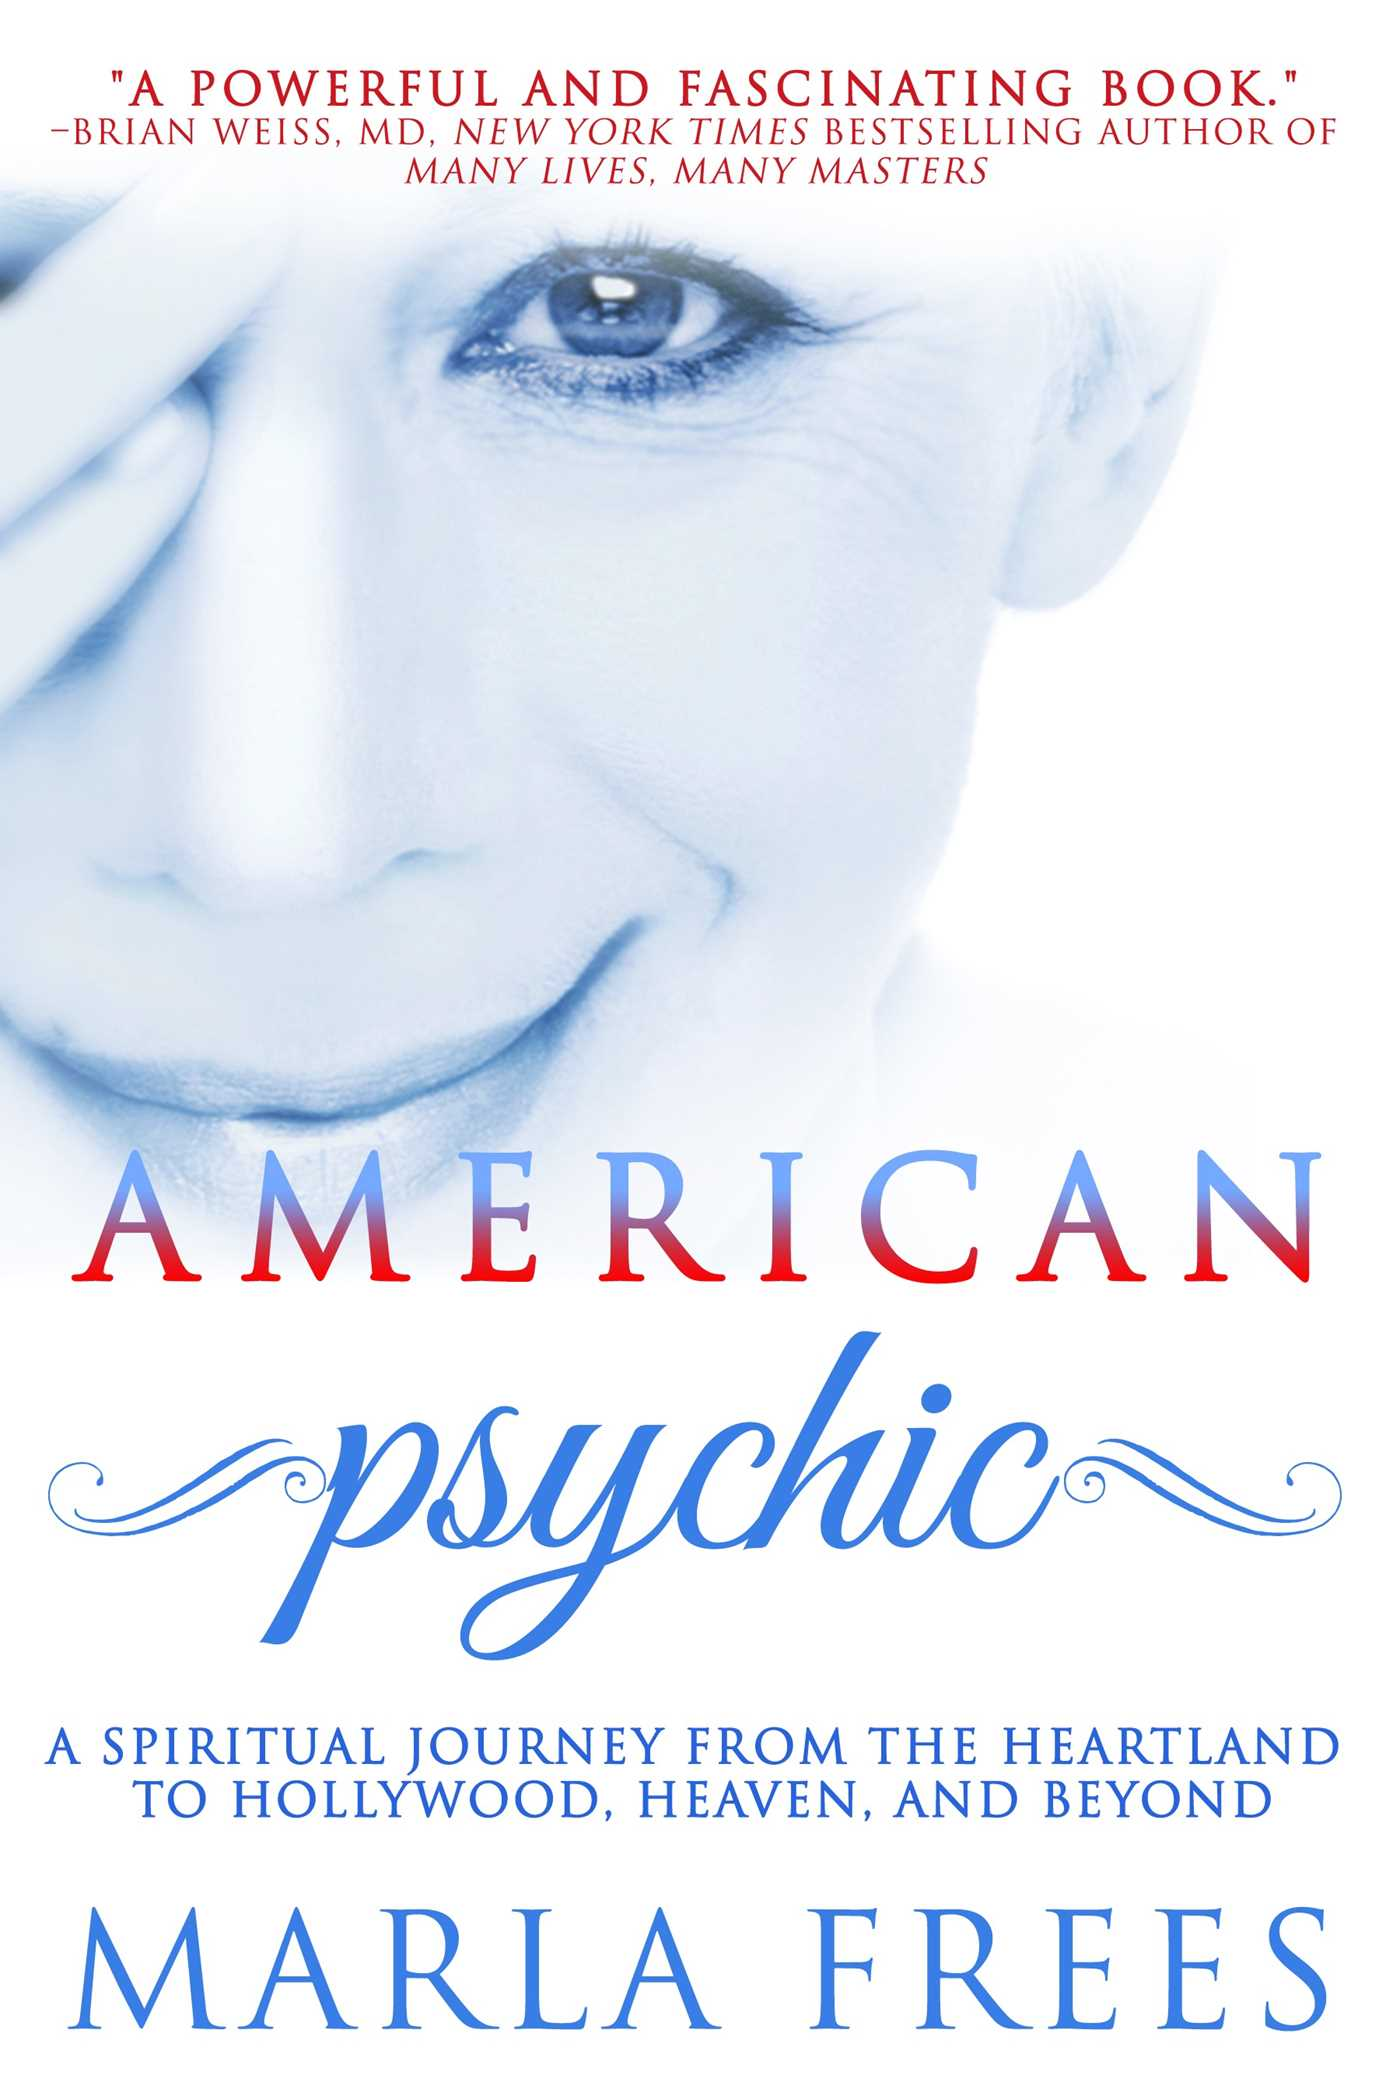 American psychic 9781682615720 hr